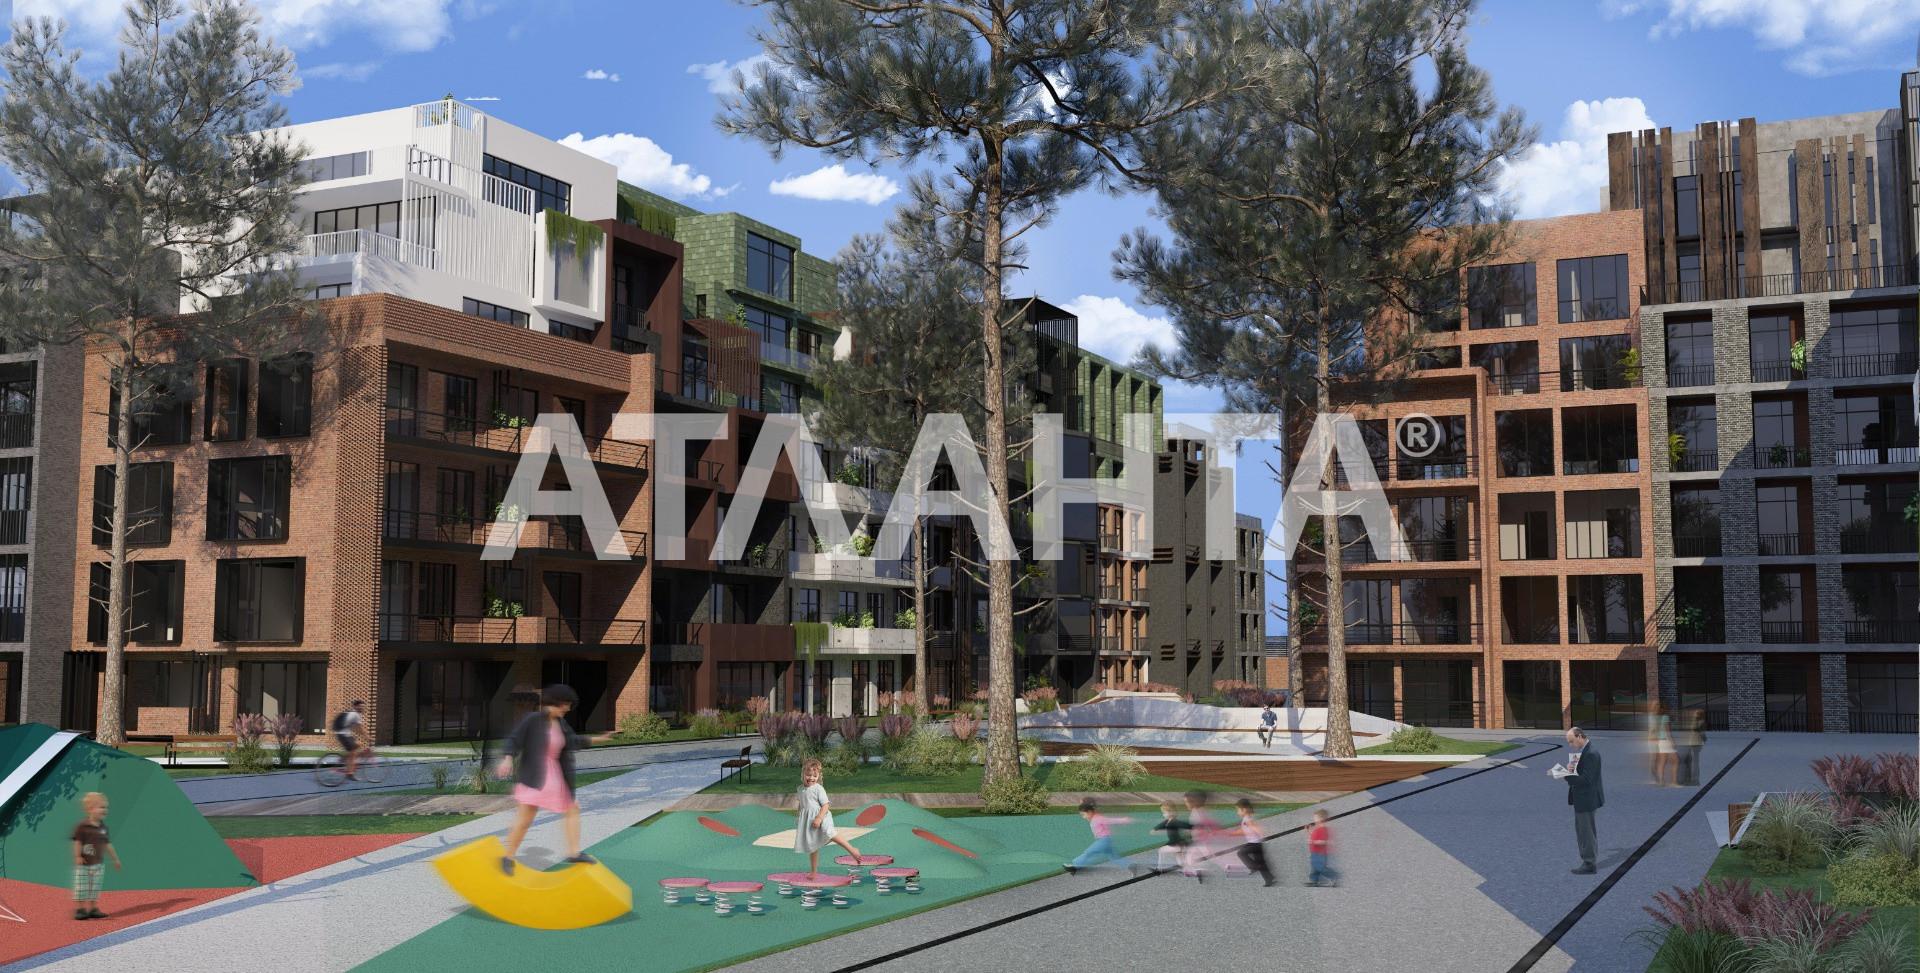 Продается 1-комнатная Квартира на ул. Донского Дмитрия — 36 850 у.е. (фото №3)